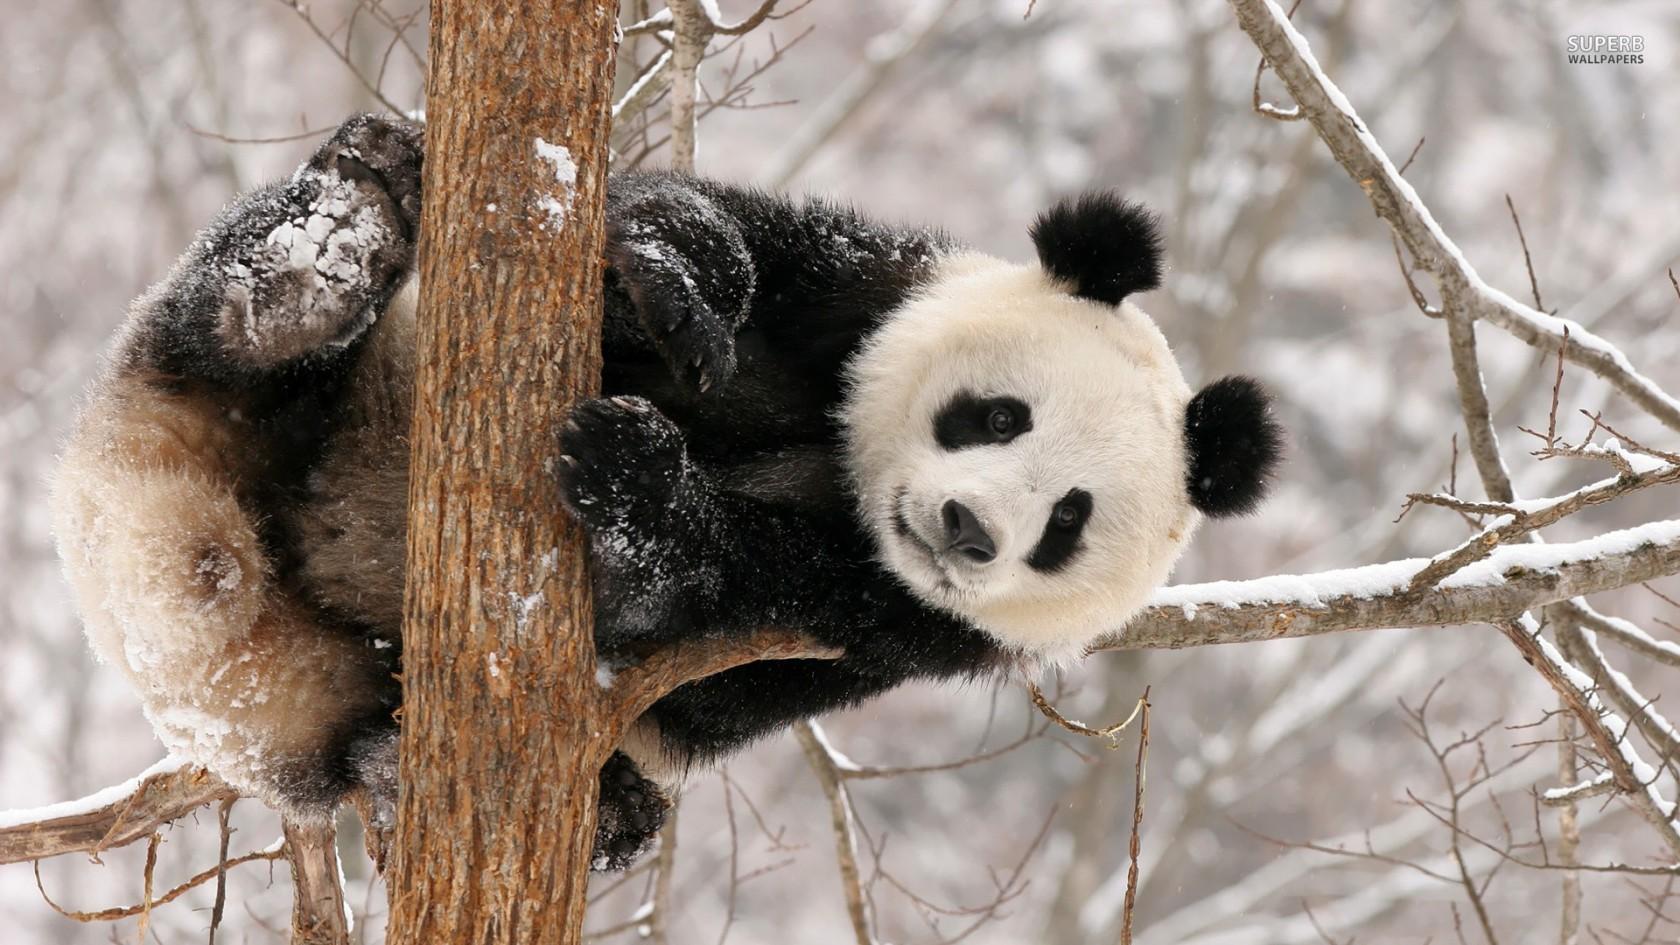 Cute Panda Baby Background Hd Wallpaper 1680x945 pixel Animal HD 1680x945